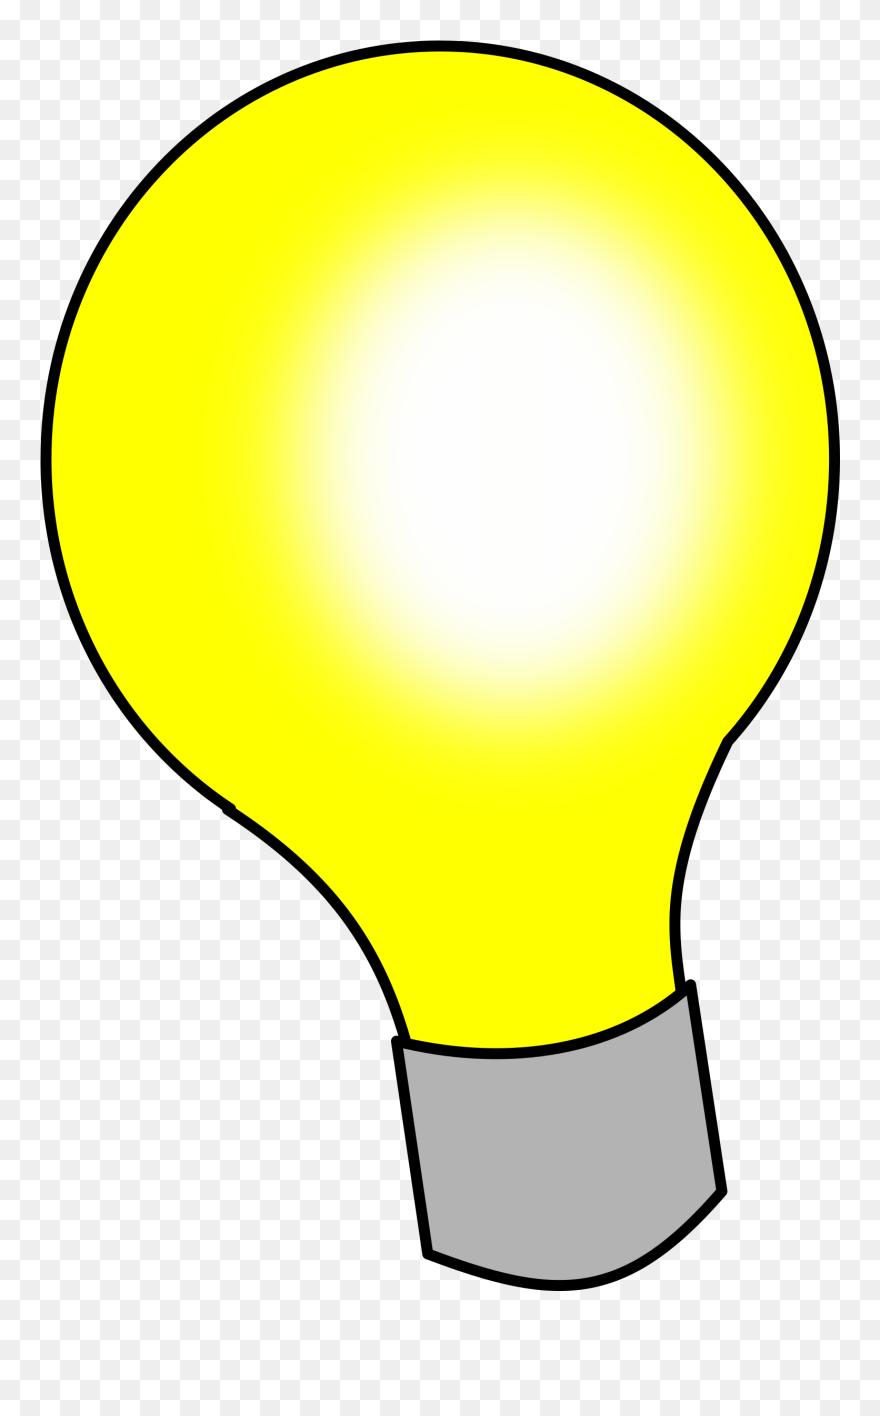 Lightbulb light bulb clip art 3 image cartoon light bulb black background png download